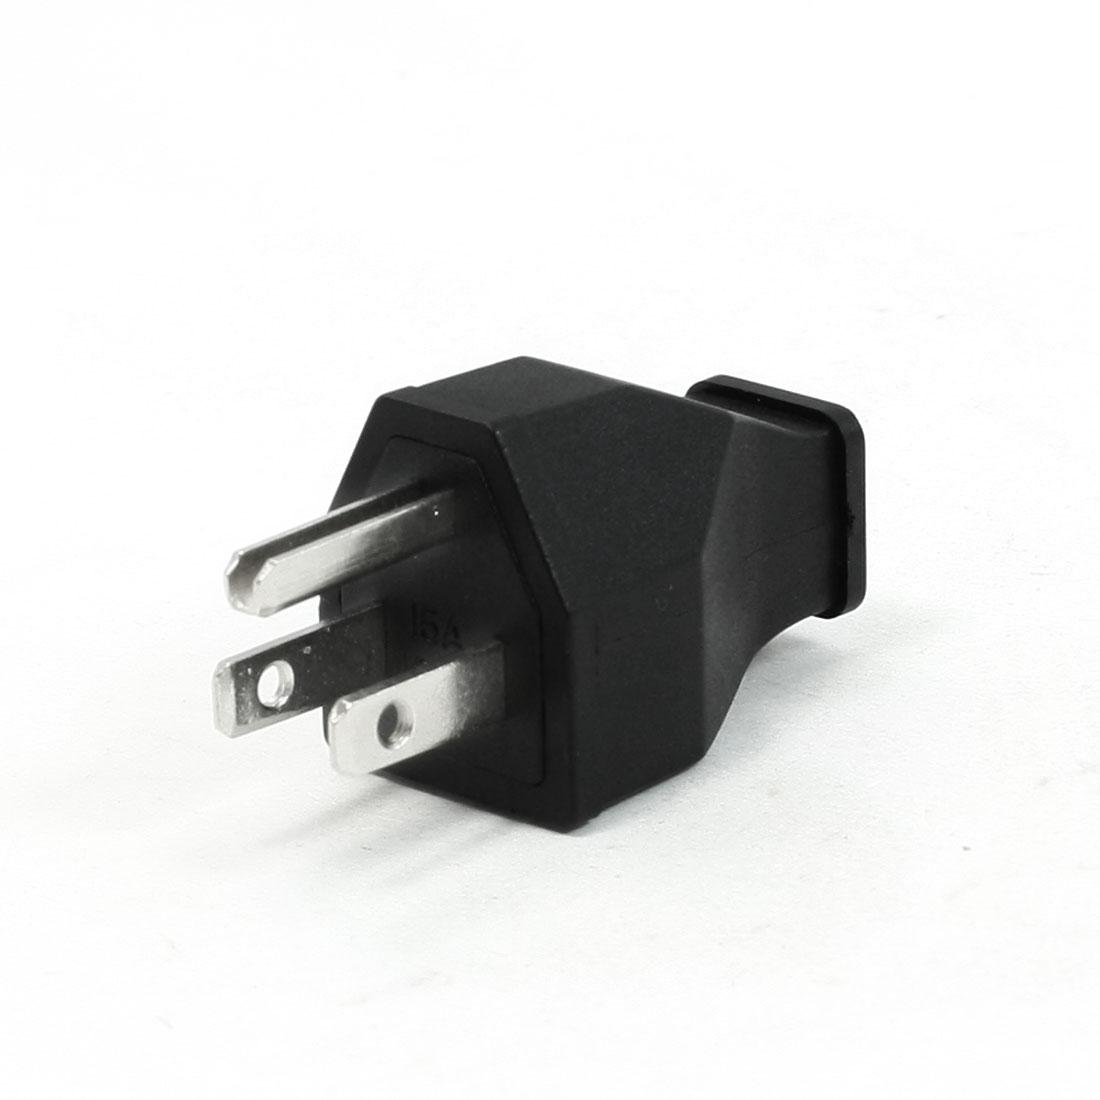 15A 125V Plastic Handle 9.5mm Cord Hole Connector 3 Terminals US Plug